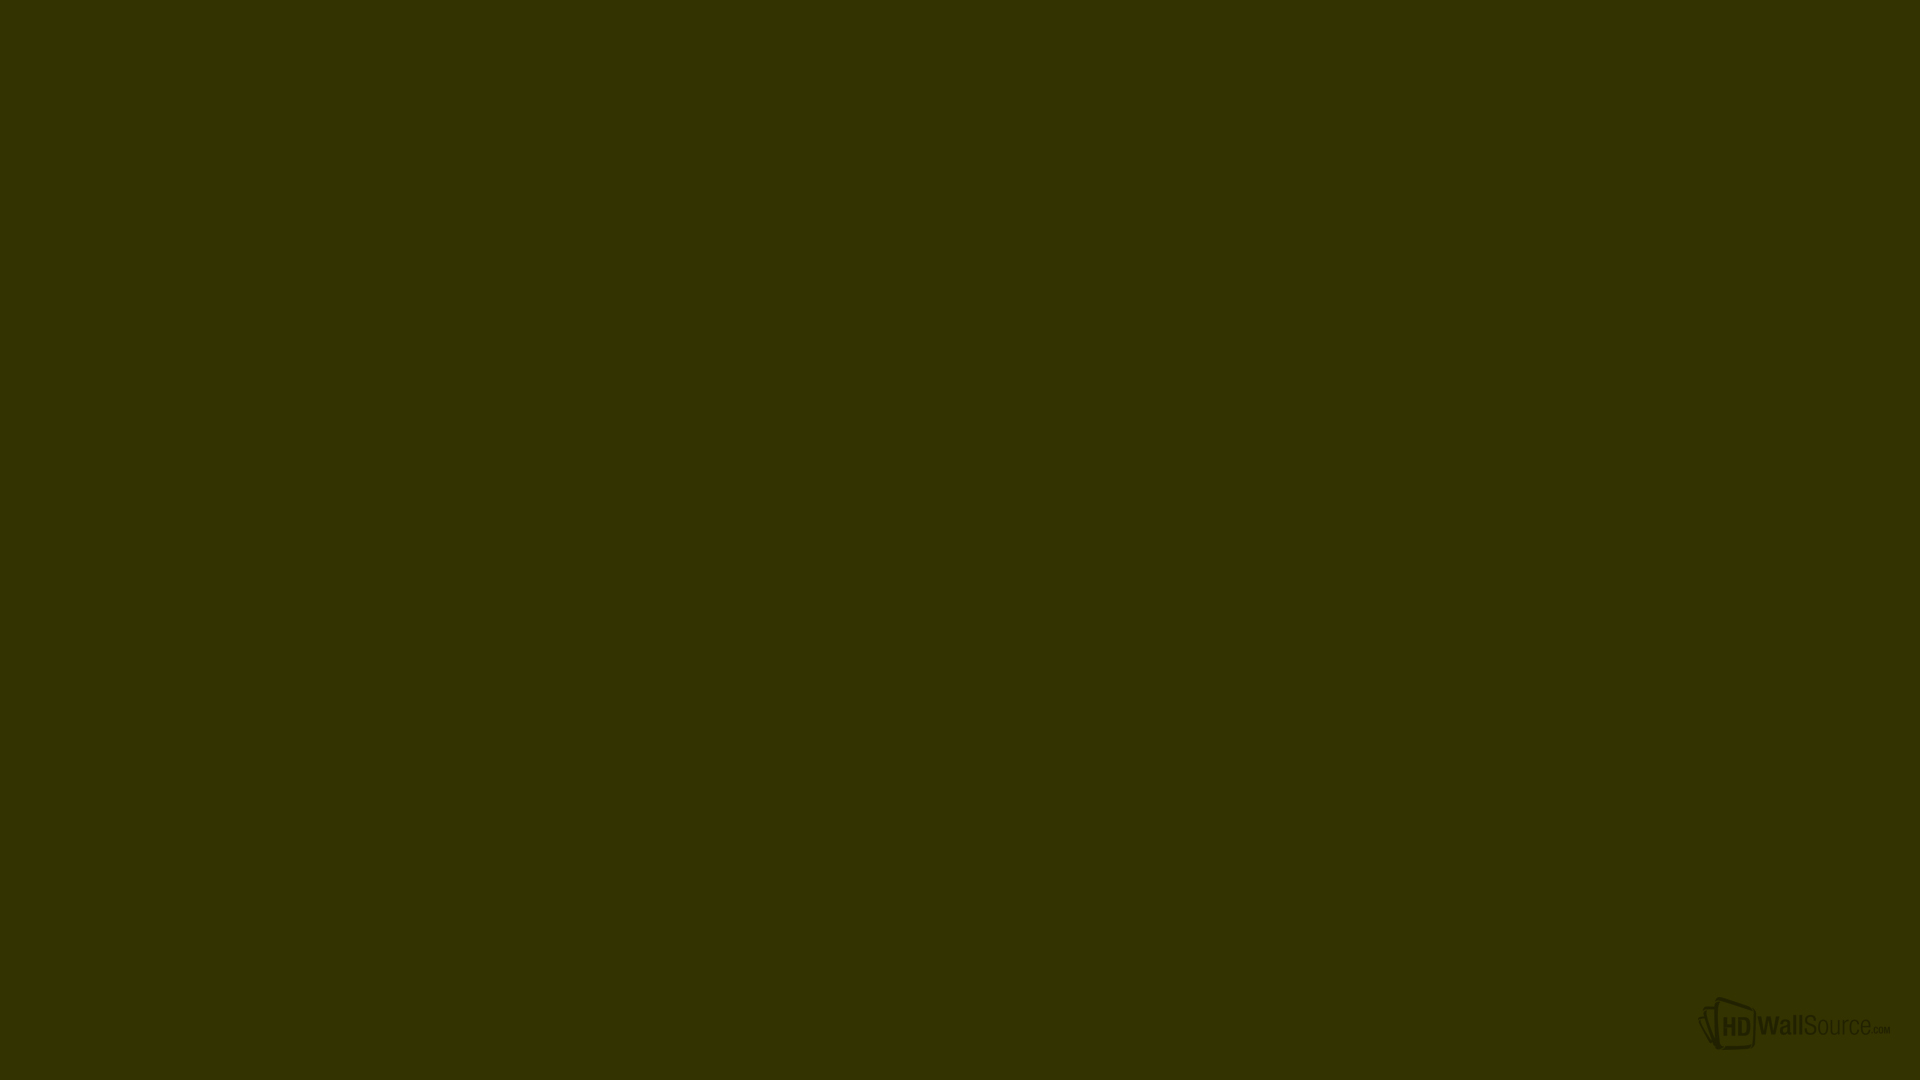 333300 wallpaper 71137